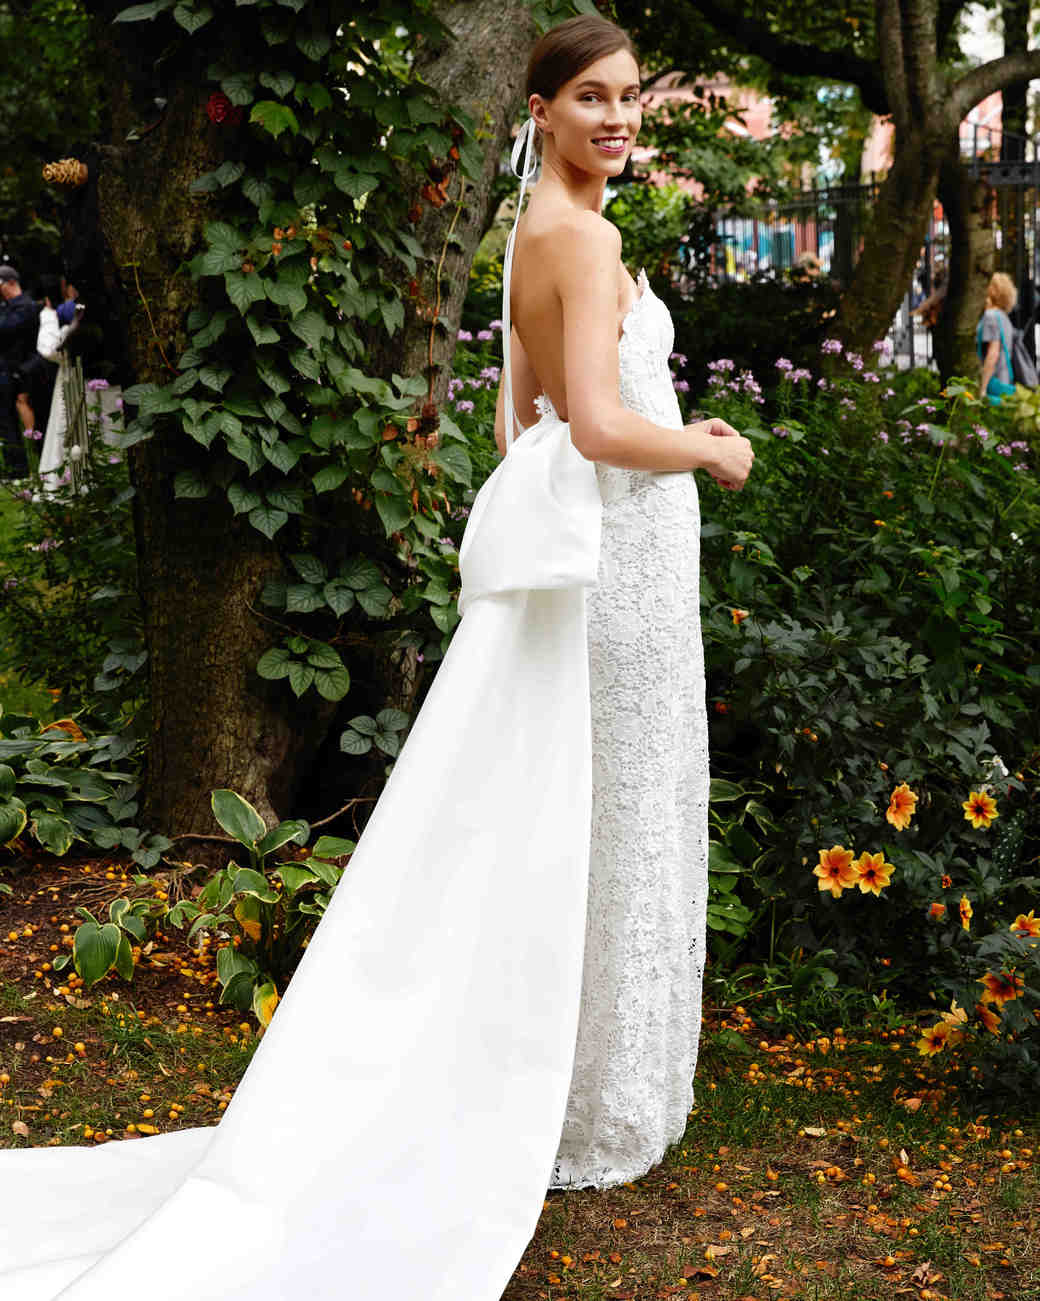 Lela Rose Strapless Wedding Dress With Train Fall 2019: Short Wedding Dresses Romantic Flowy At Reisefeber.org